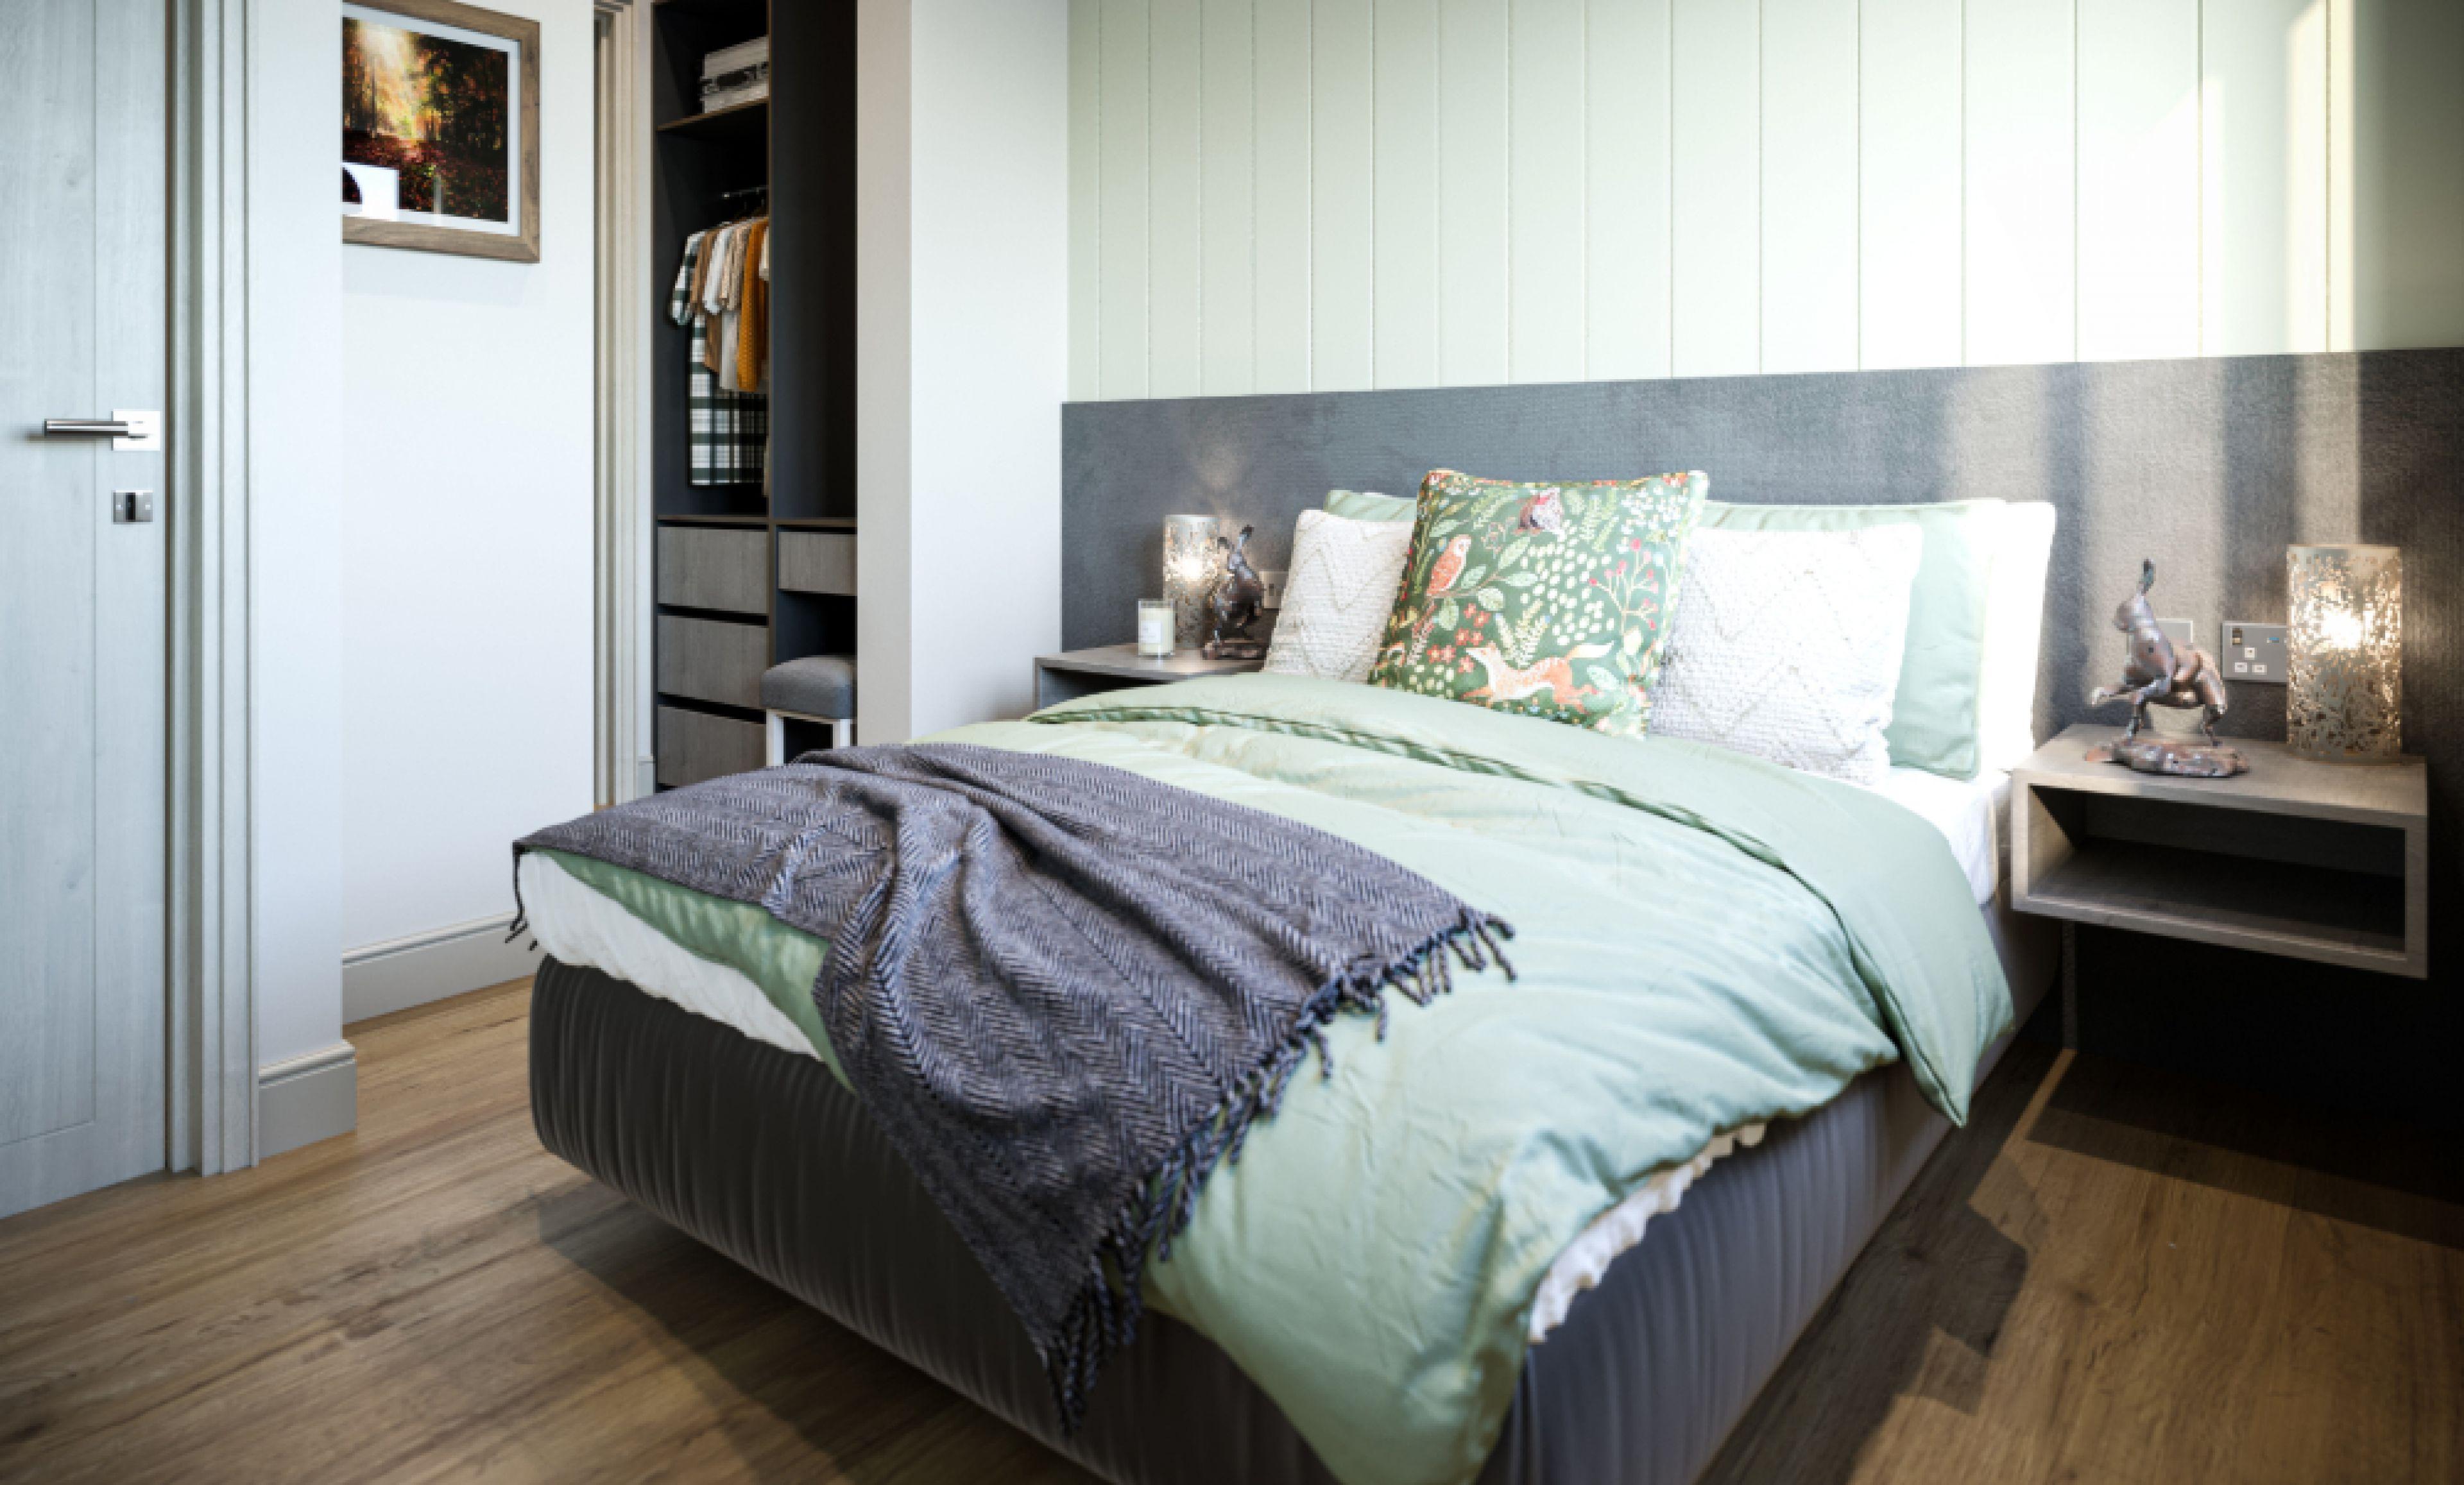 Brampton - The Bedroom